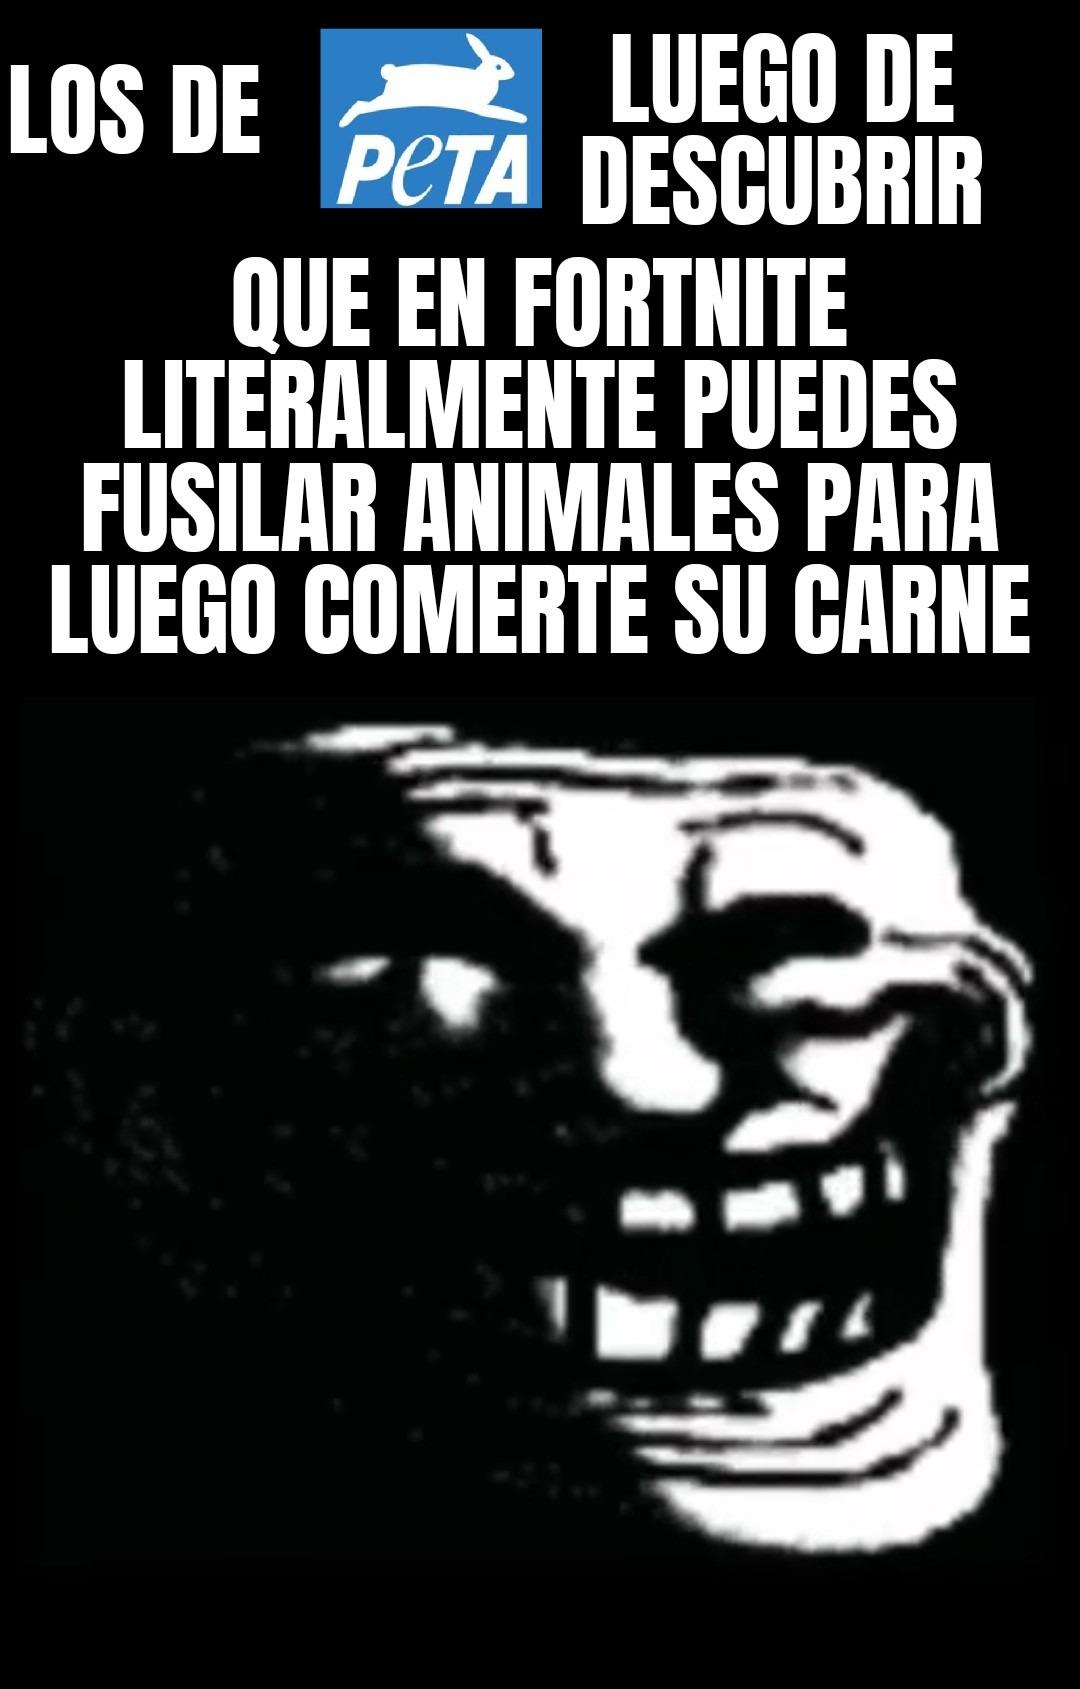 Organización vegana radical - meme